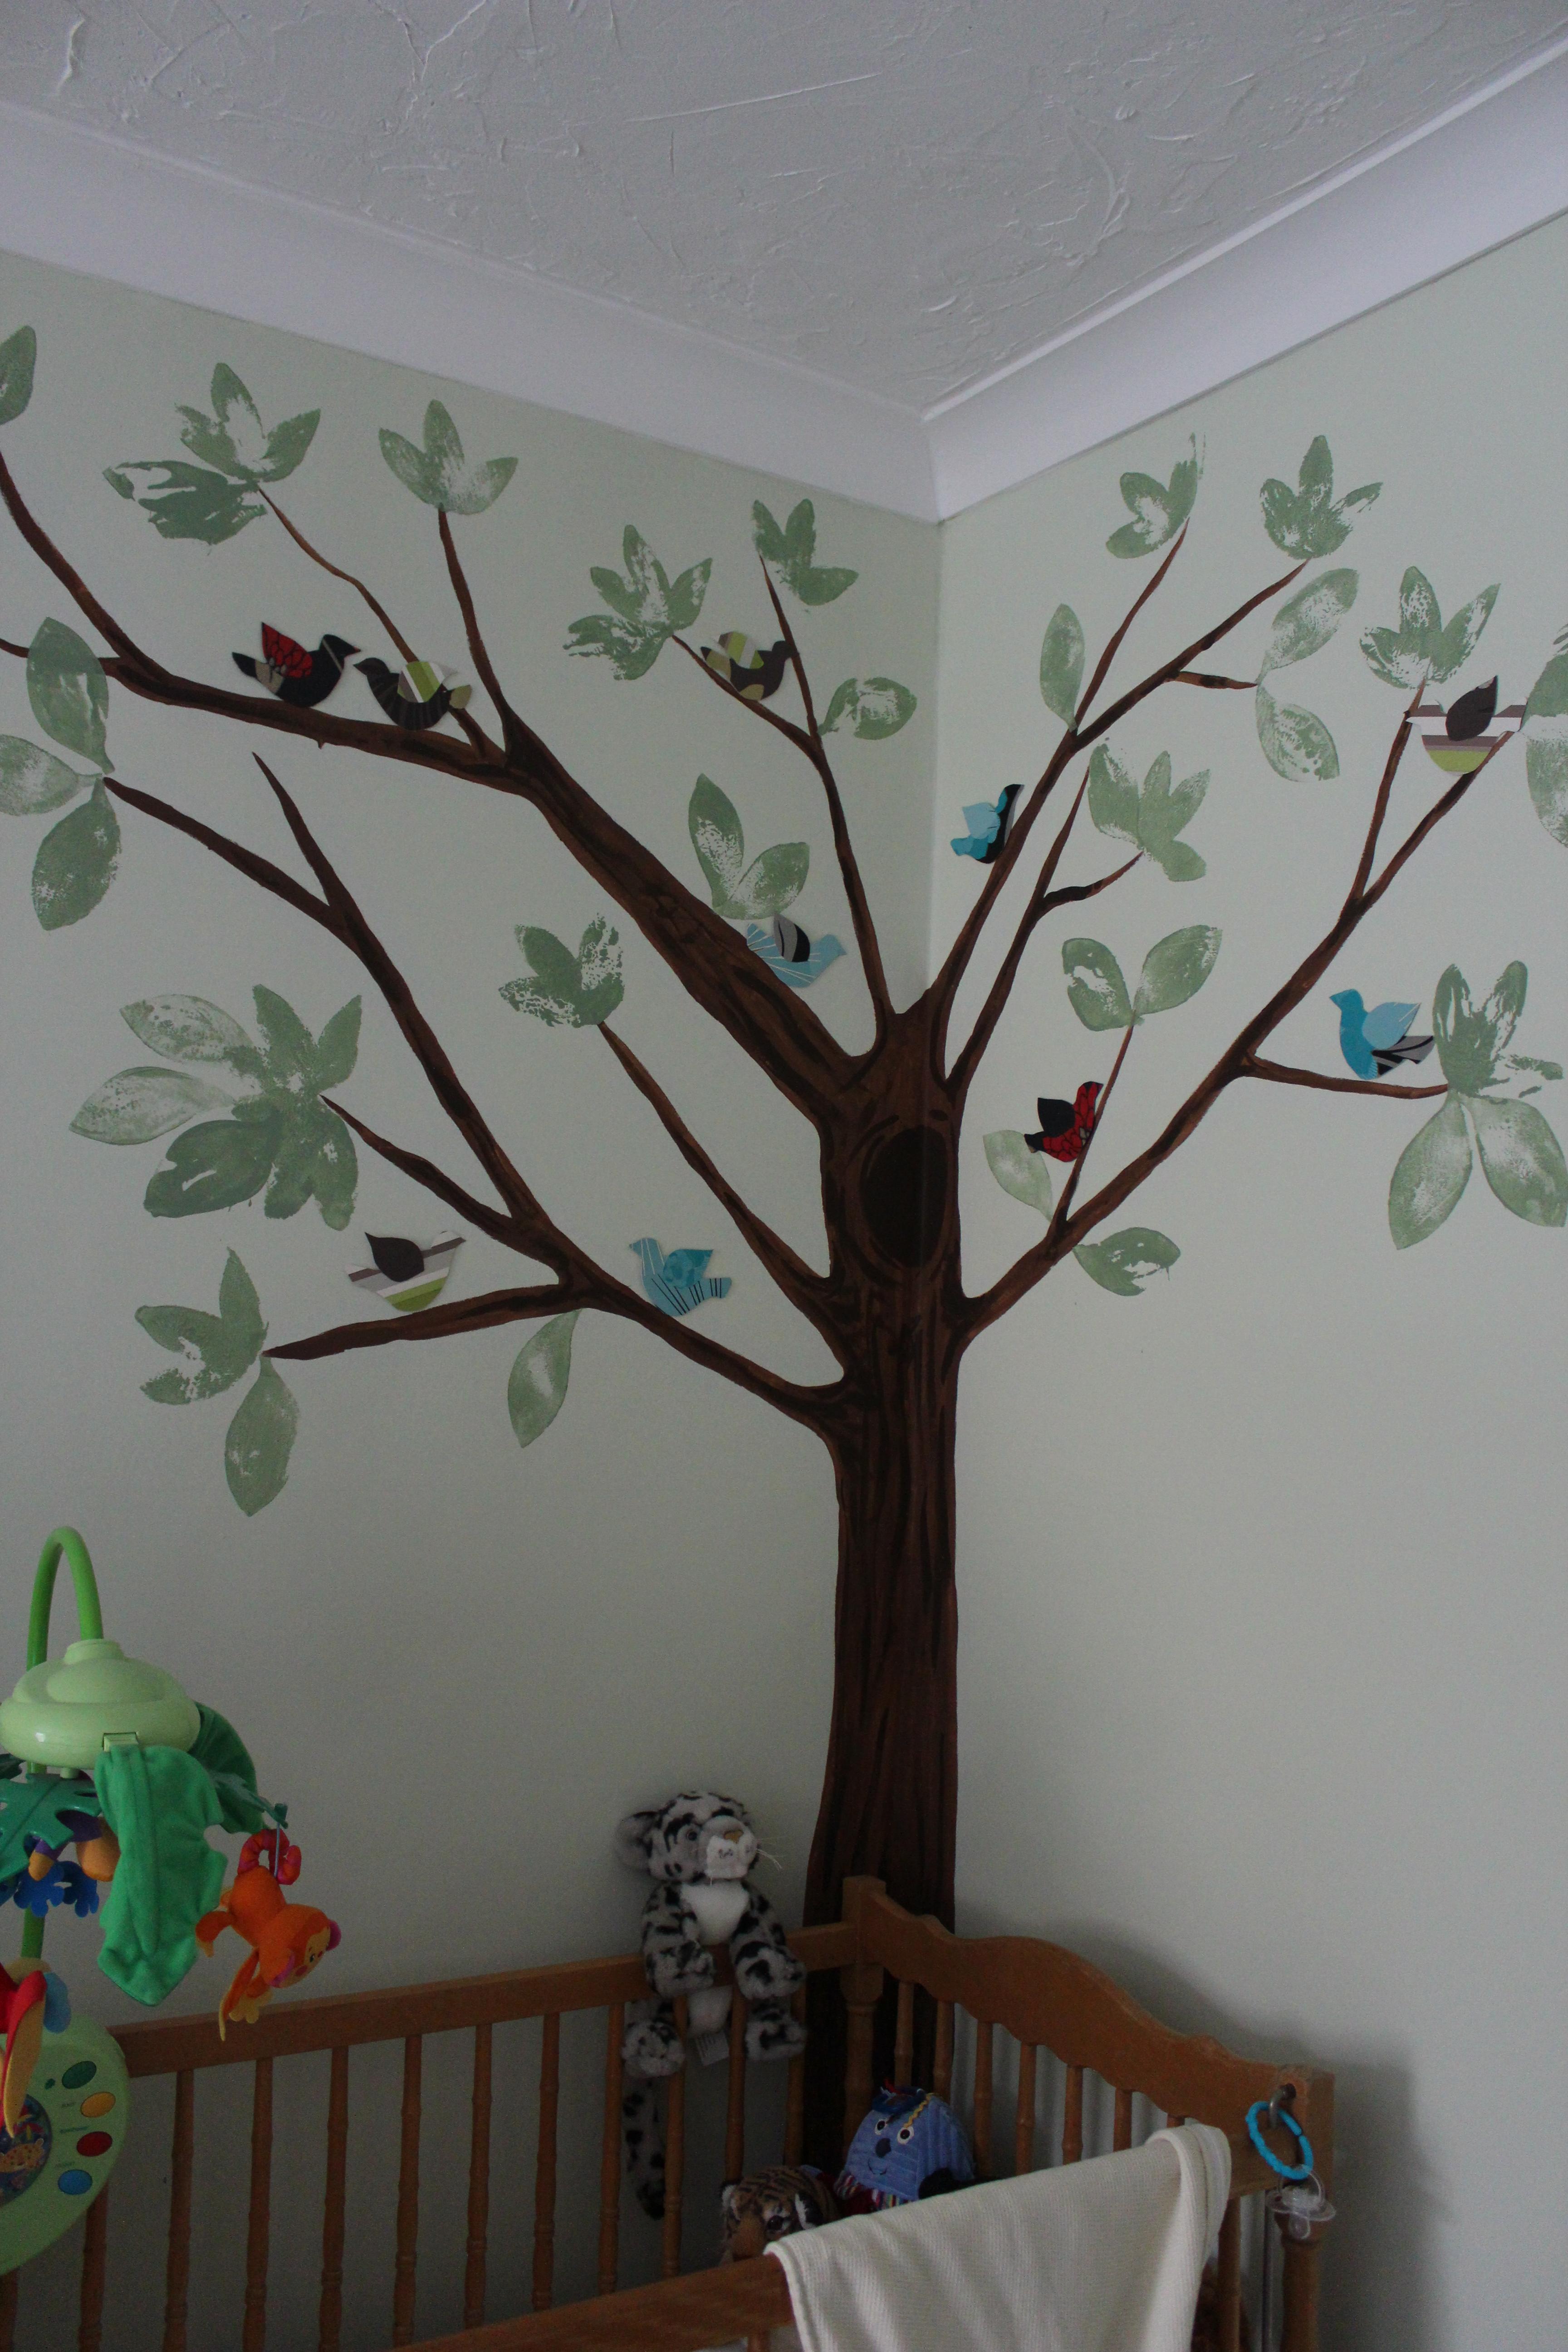 Painted tree for nursery wall nursery paint tree birch for Beautiful birch tree wall mural